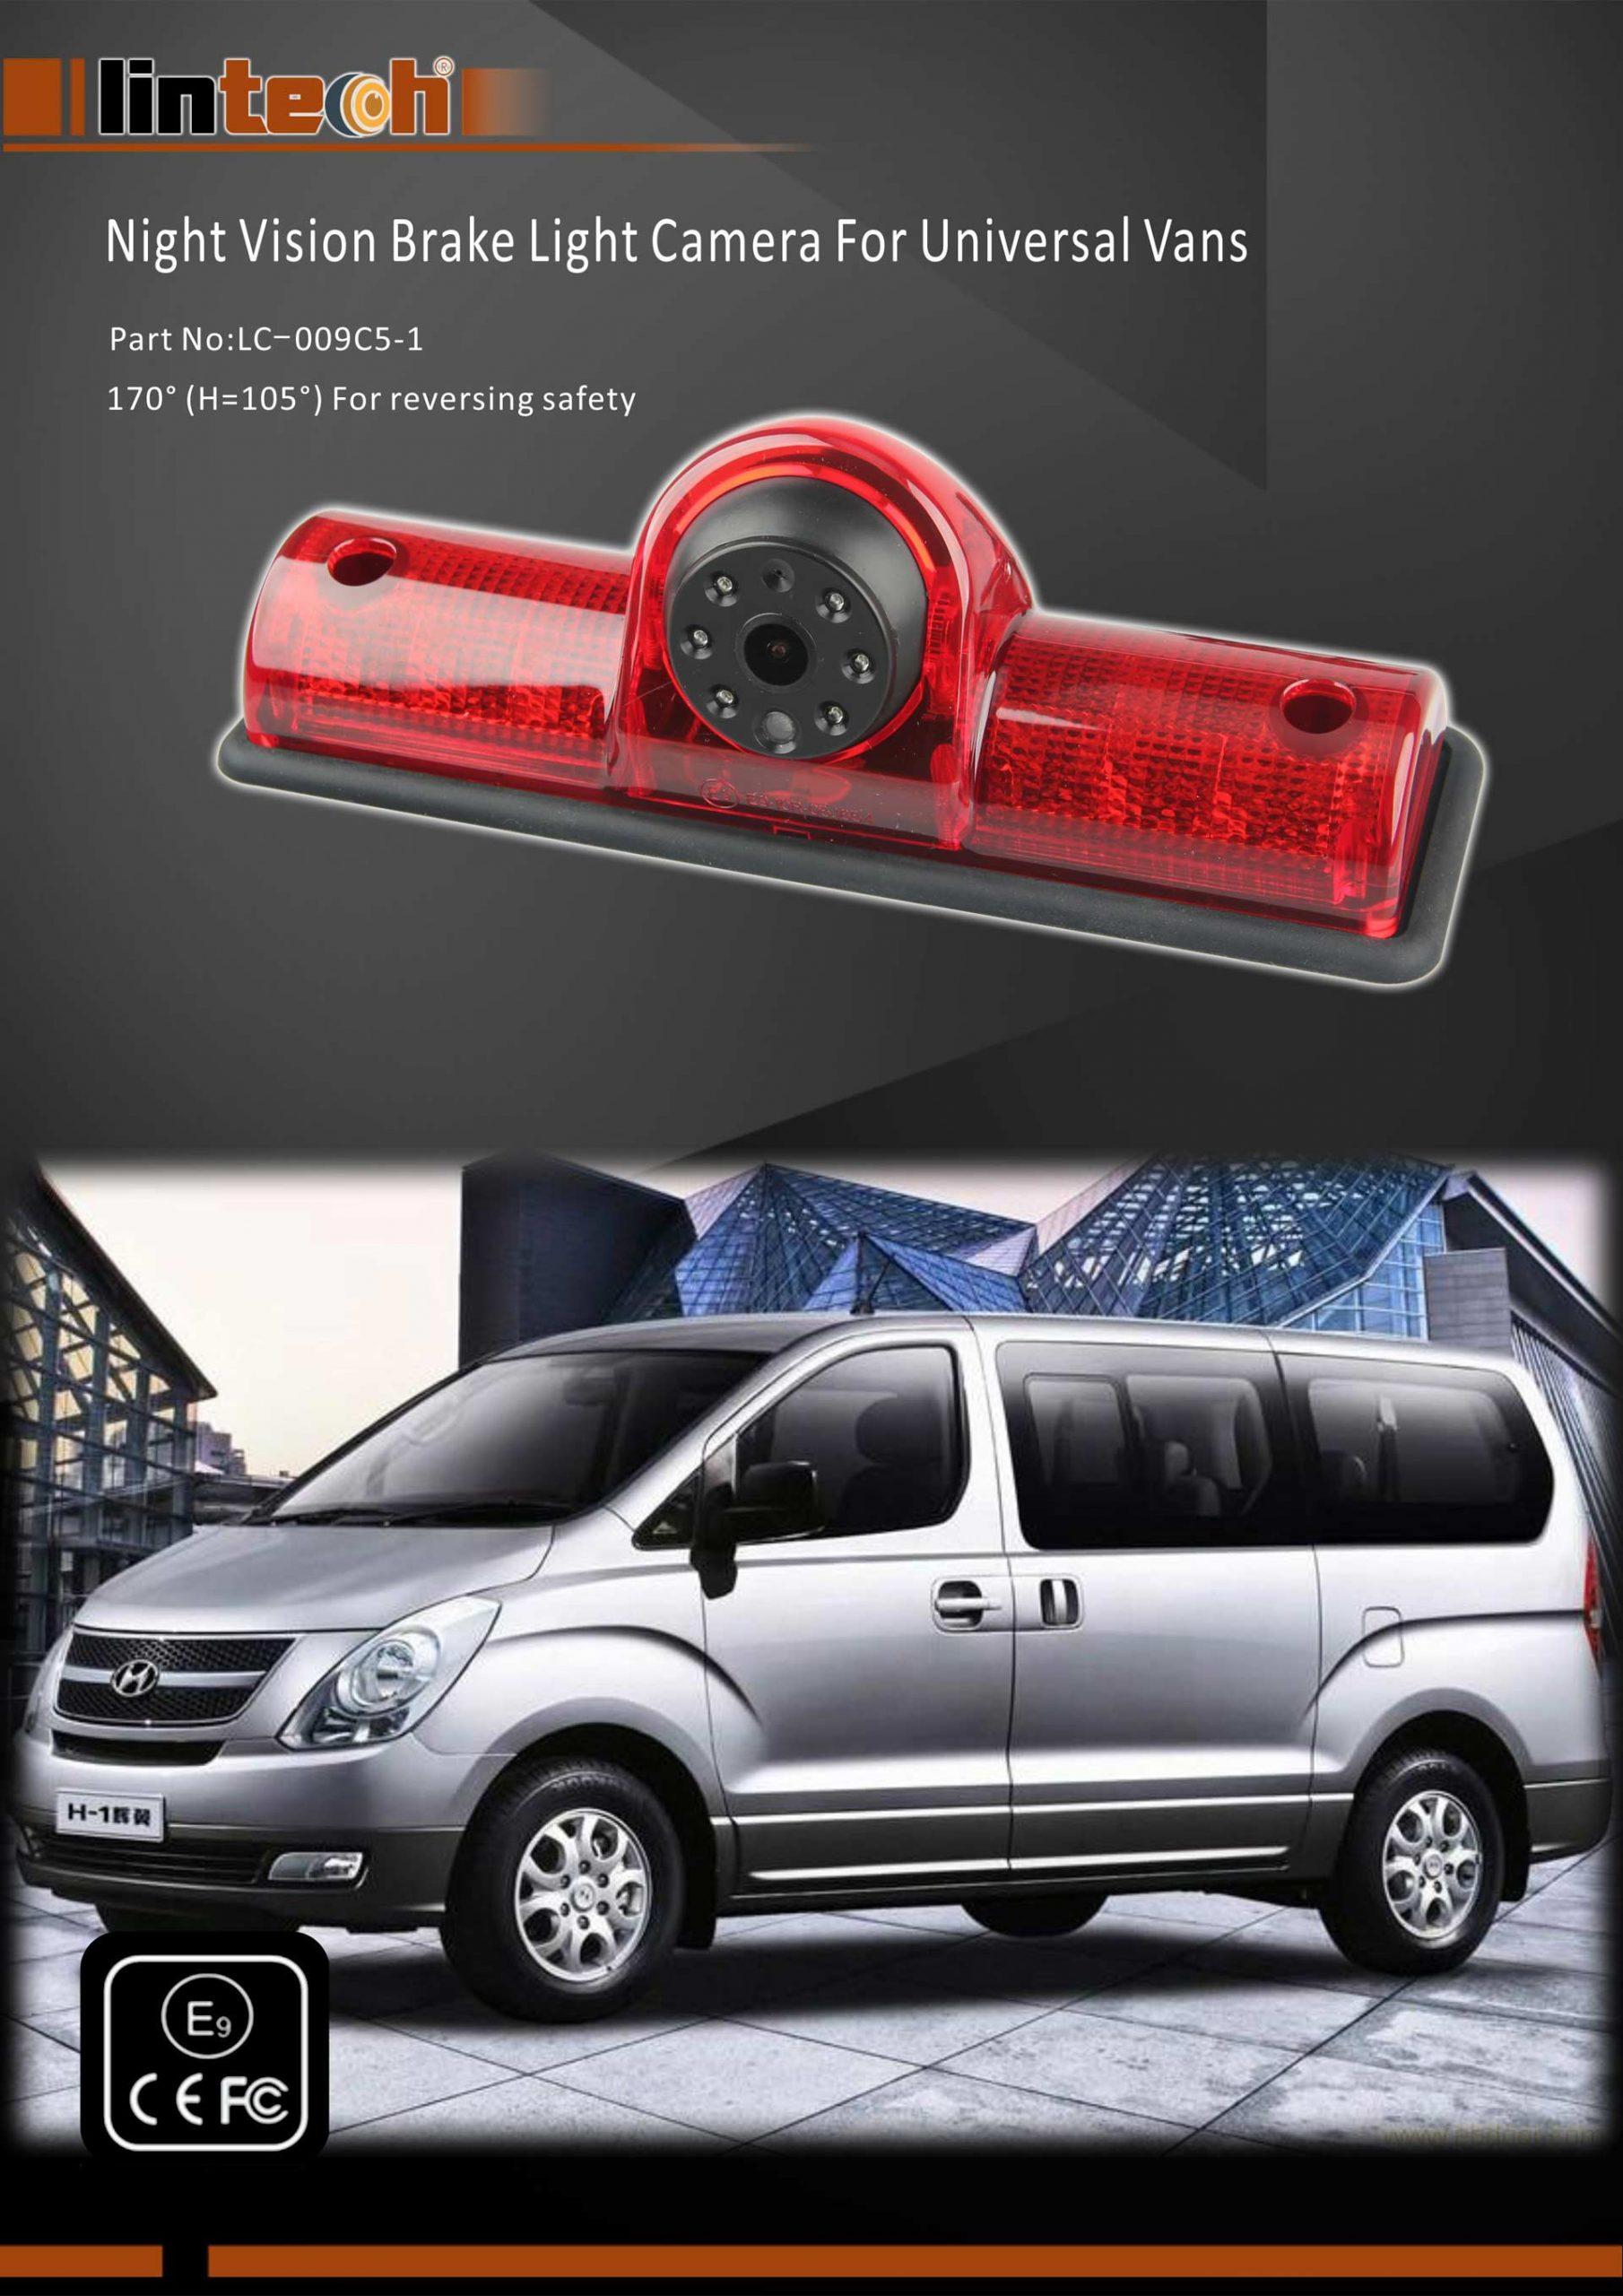 1.Night Vision Brake Light Camera for Universal Vans